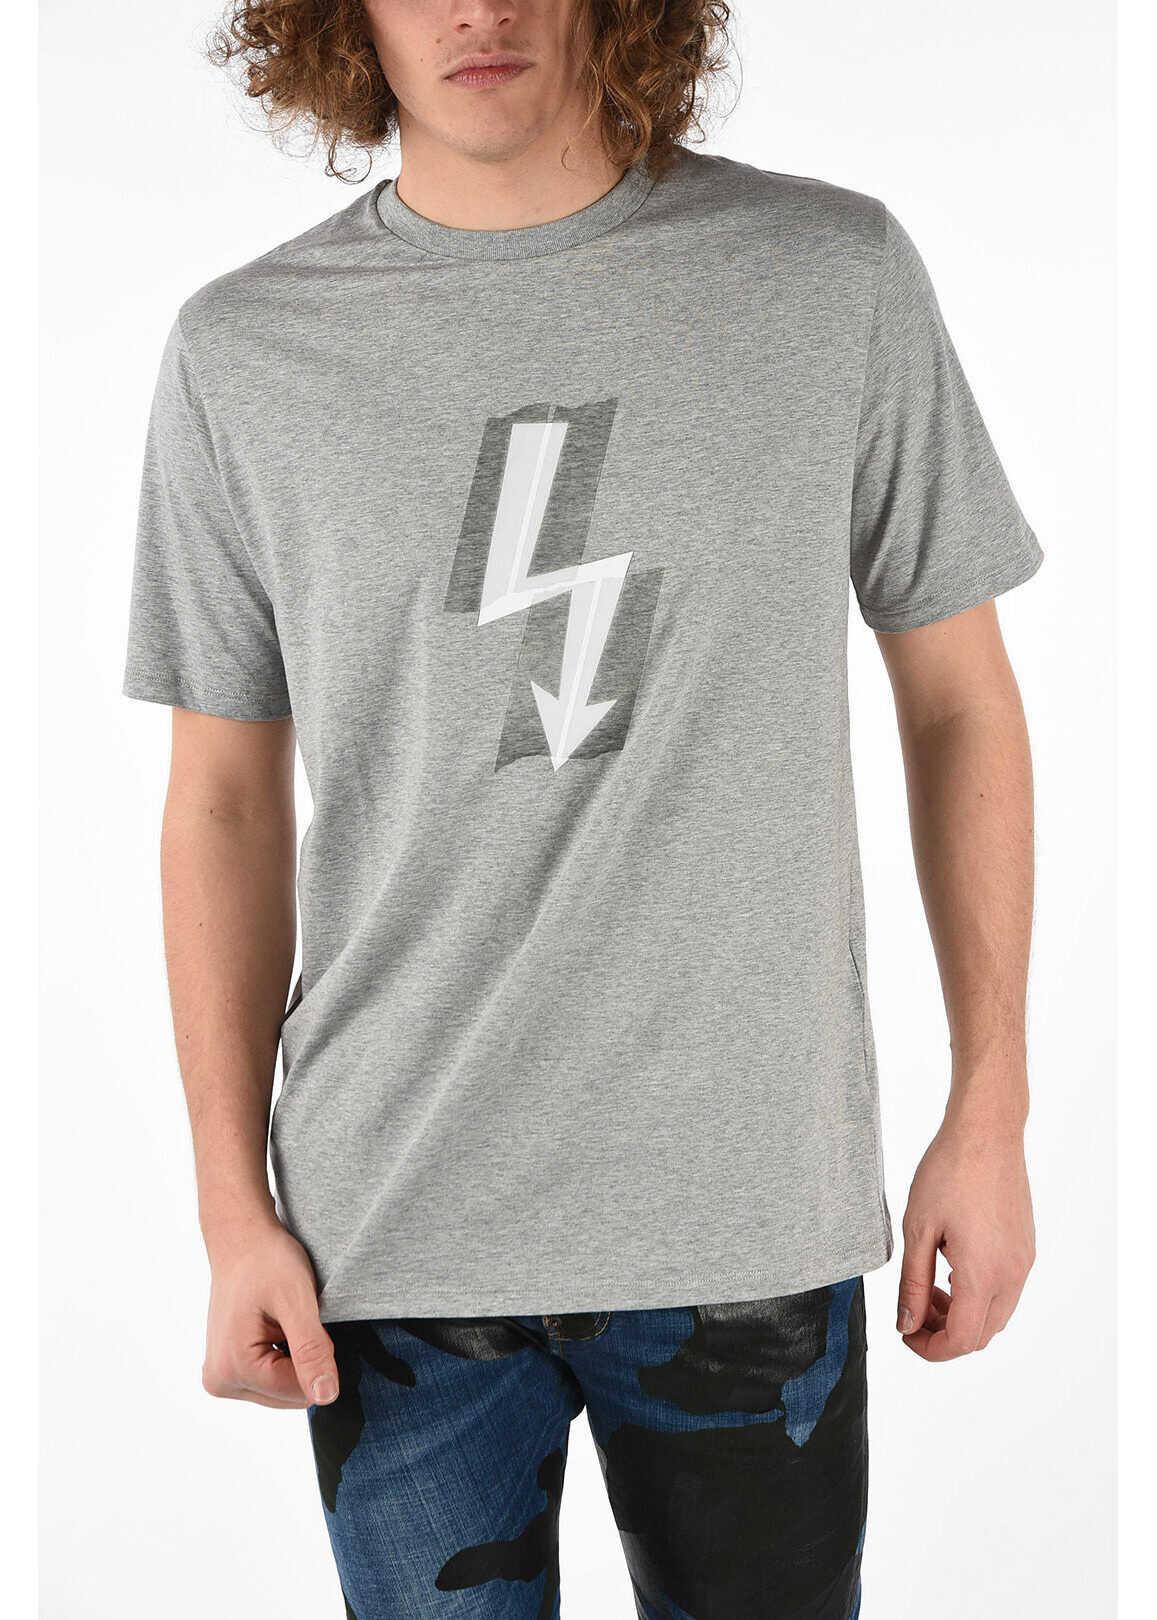 Neil Barrett Oversized THUNDERBOLT Crewneck T-shirt GRAY